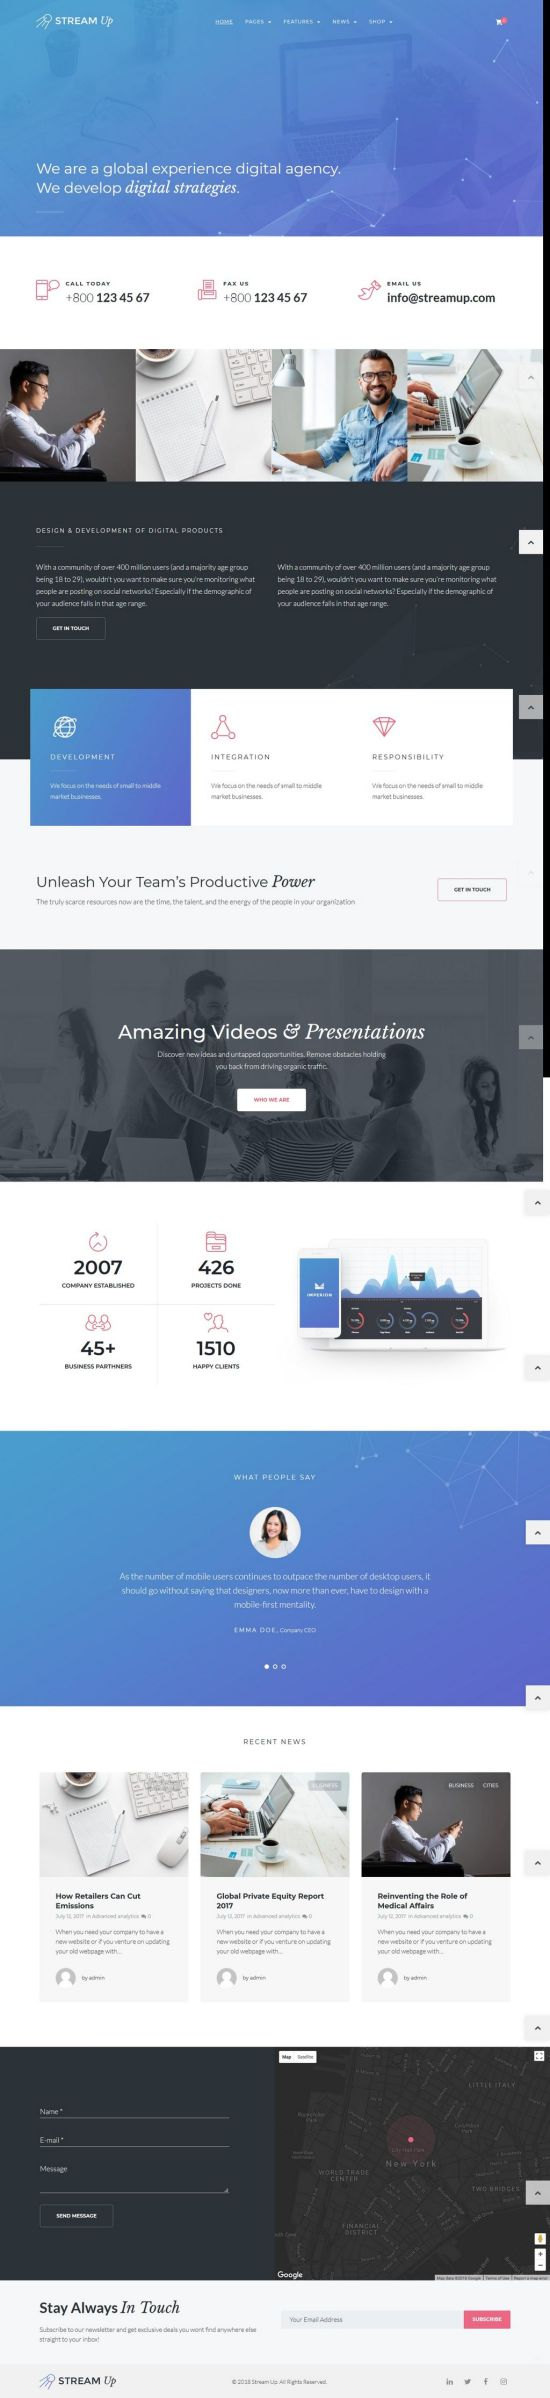 stream up wordpress theme 01 - Stream UP WordPress Theme